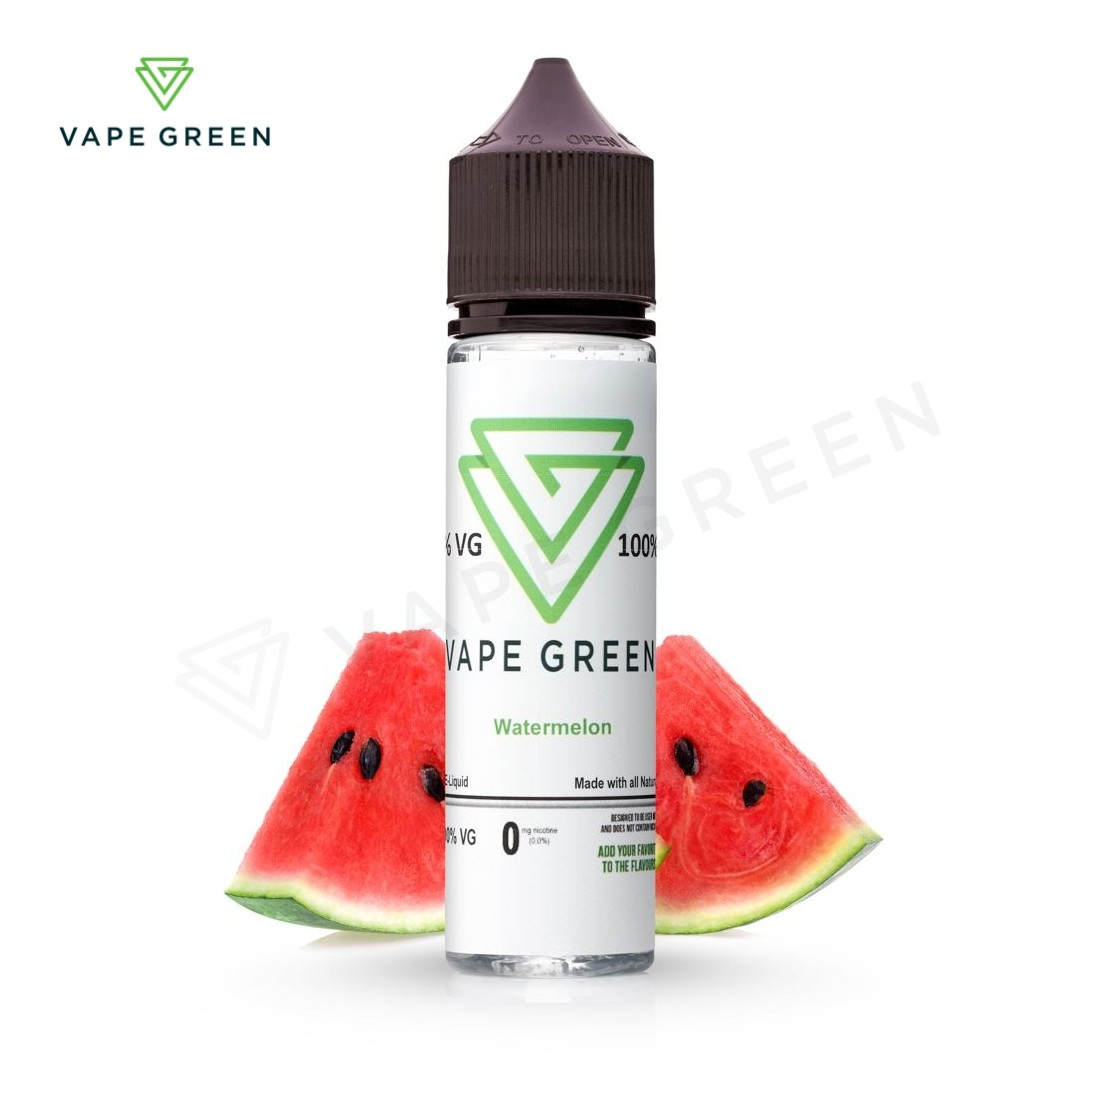 Watermelon E-Liquid by VapeGreen 50ml